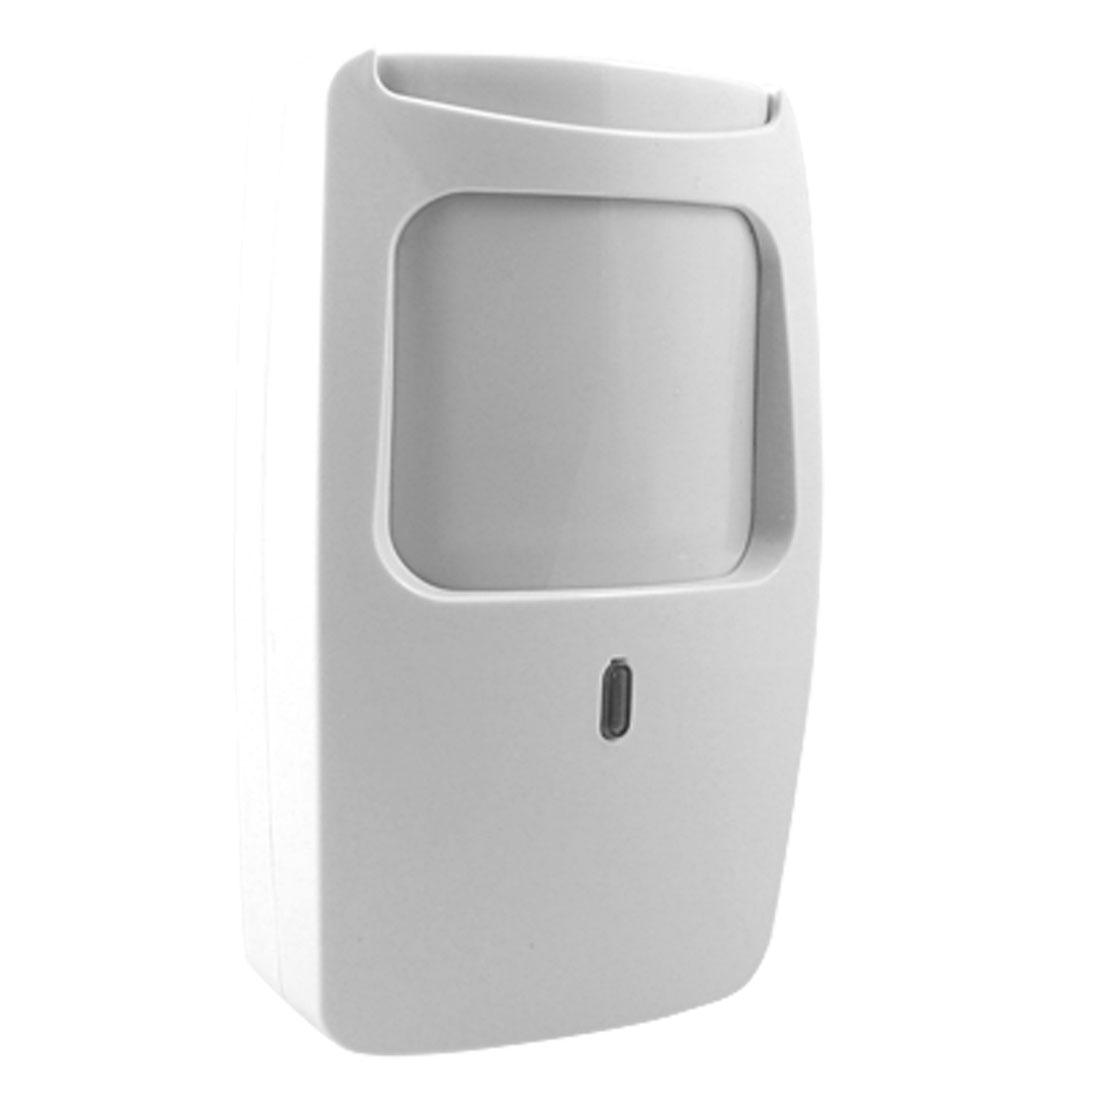 Dual Infrared Microwave Digital Wireless Motion Sensor Detector Alert System PIR Alarm DT-7225